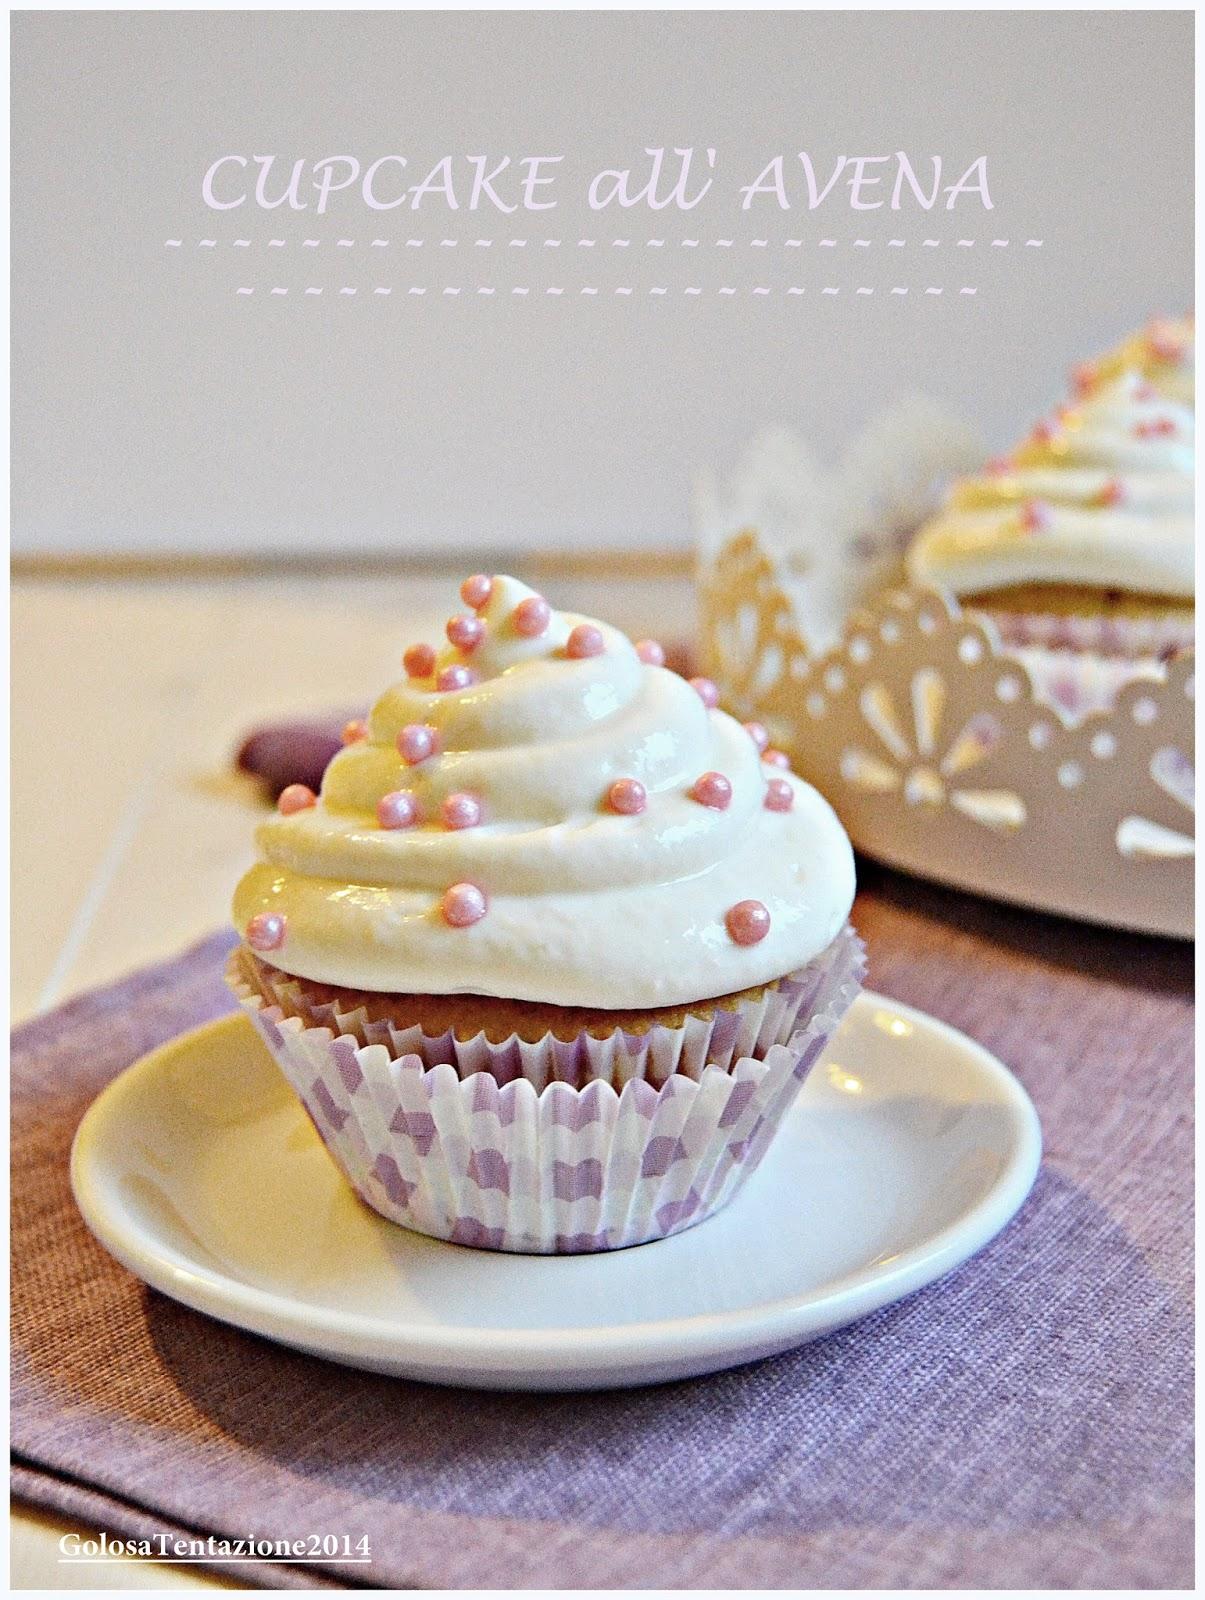 cupcake all'avena